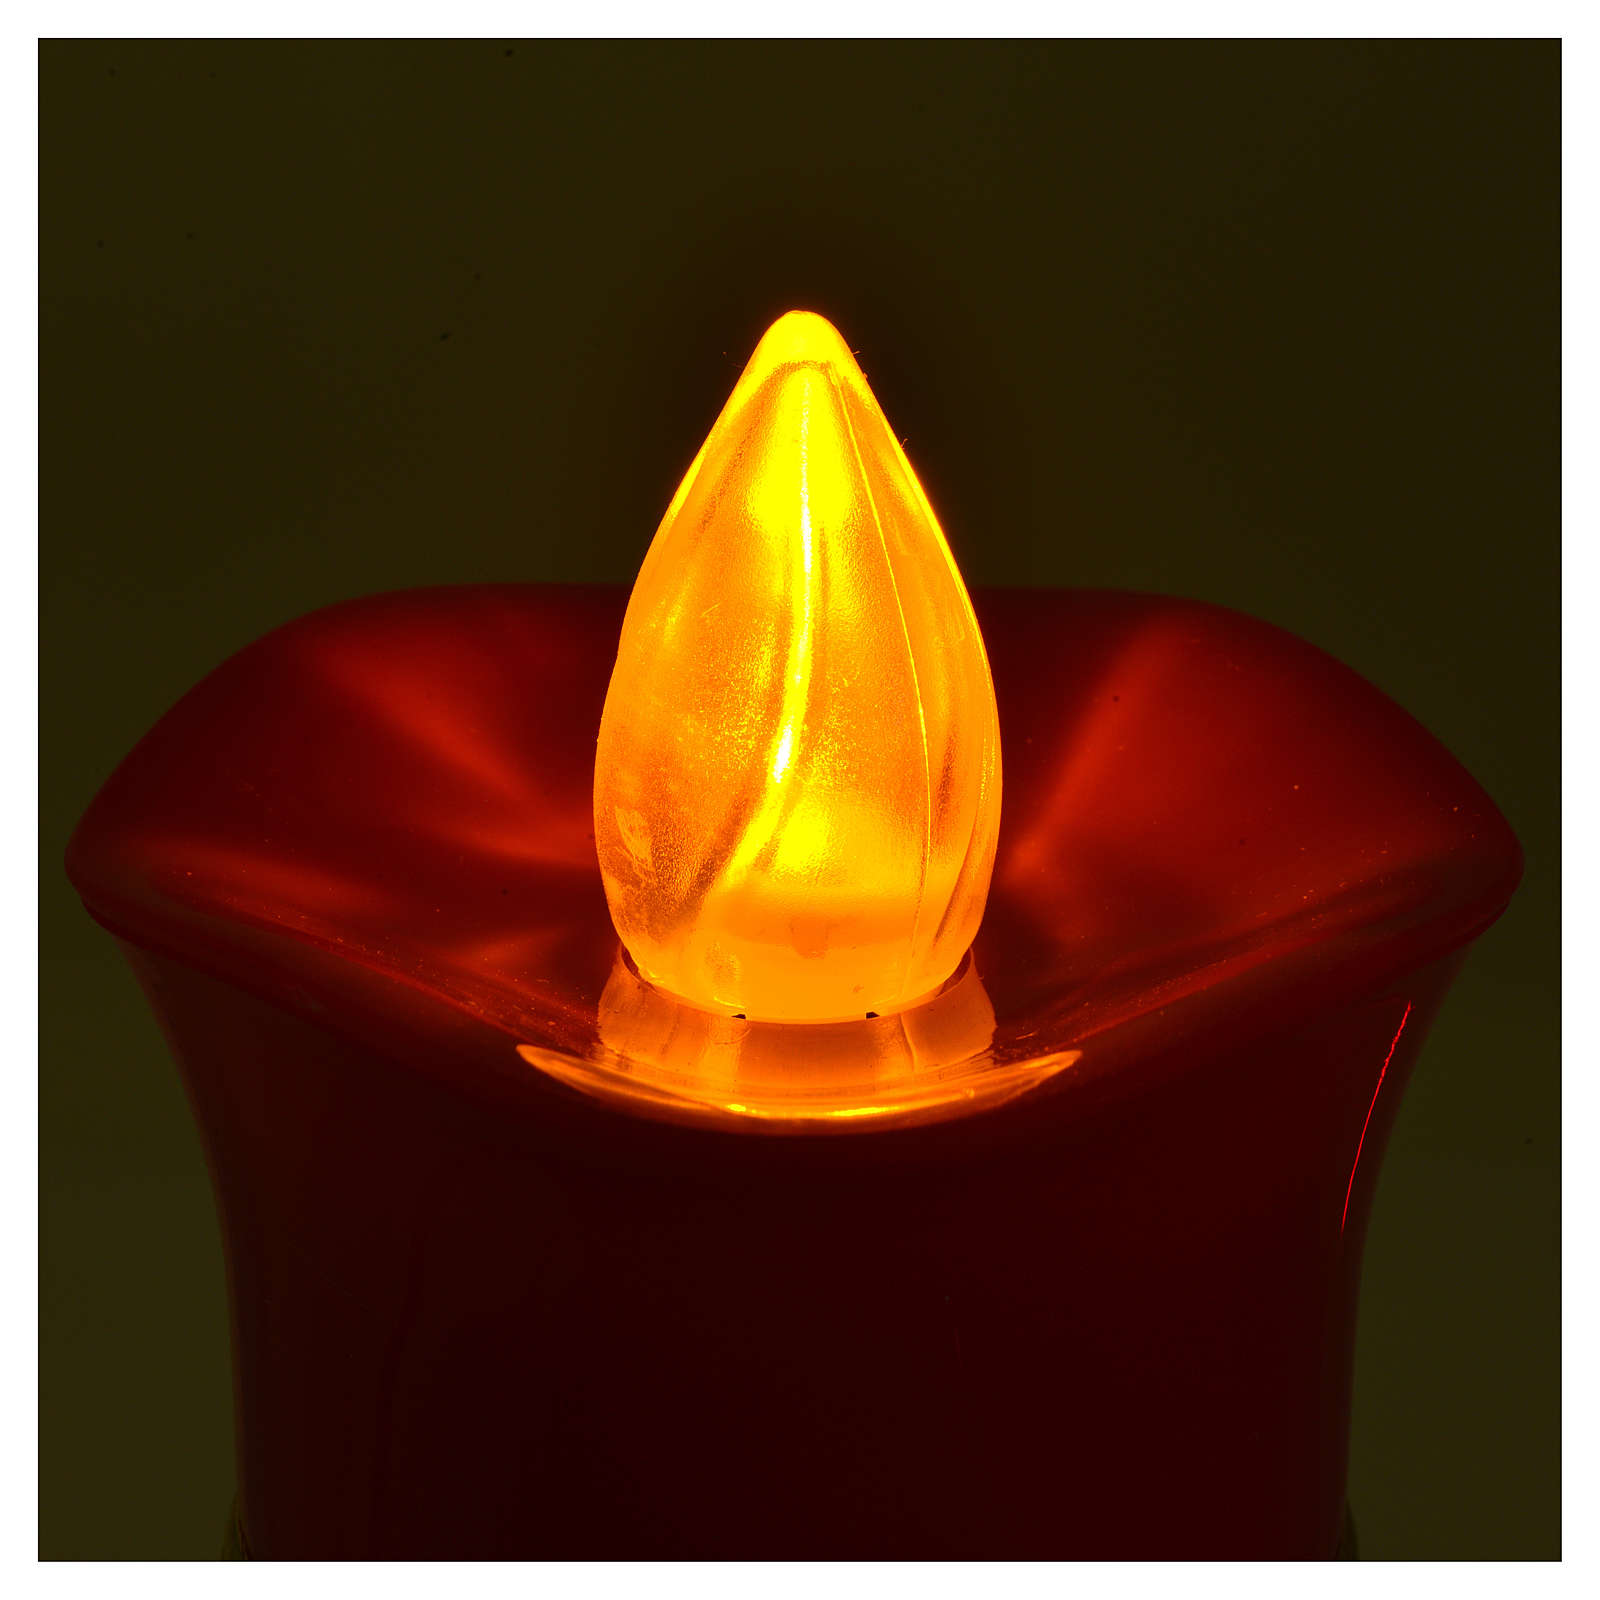 Vela votiva Lumada imagen Jesús blanco luz amarilla parpadeante 3